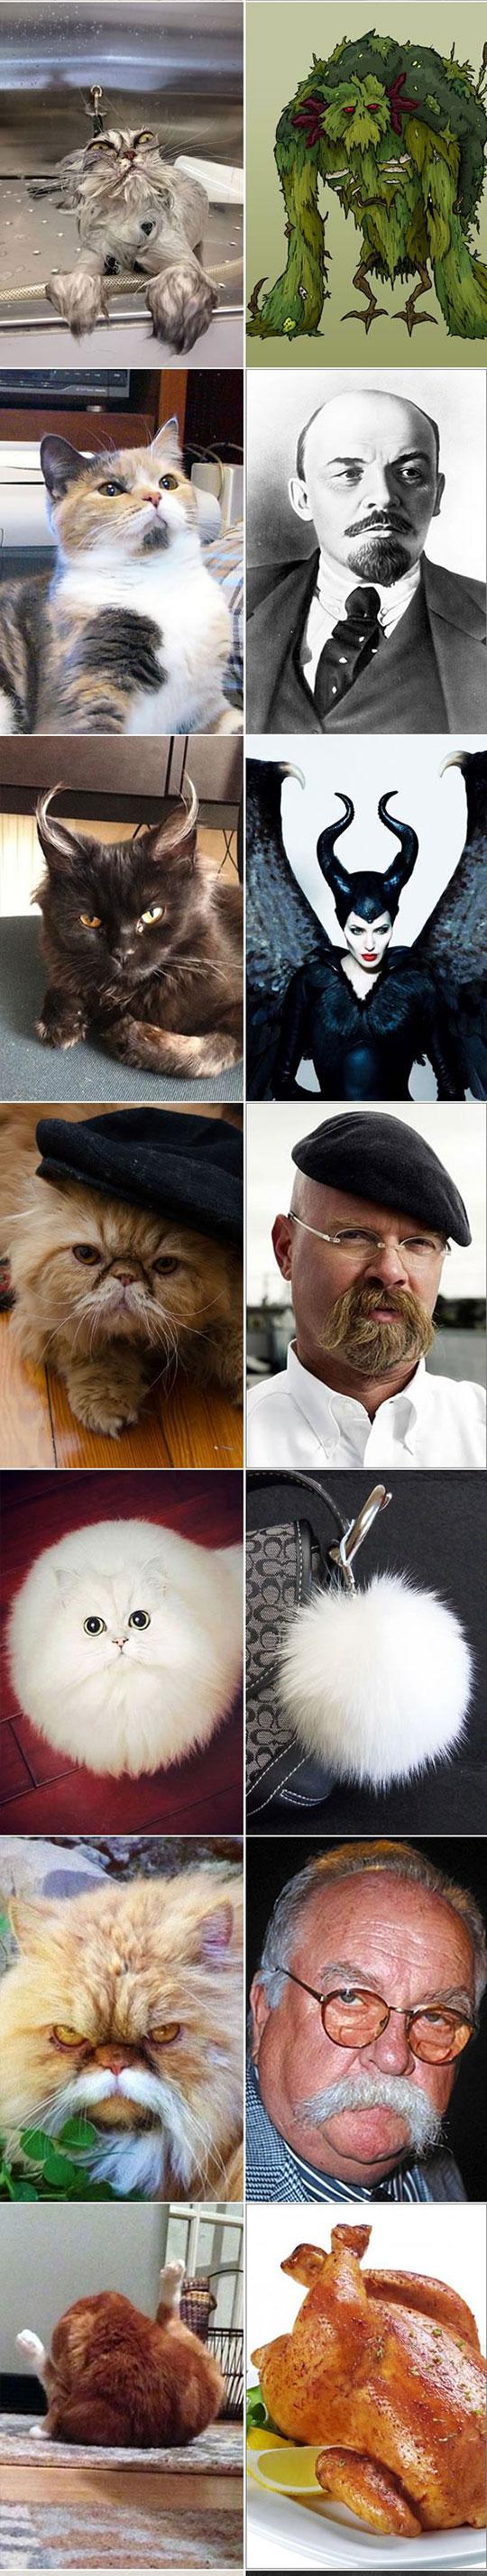 cool-cats-lookalike-Freud-chicken